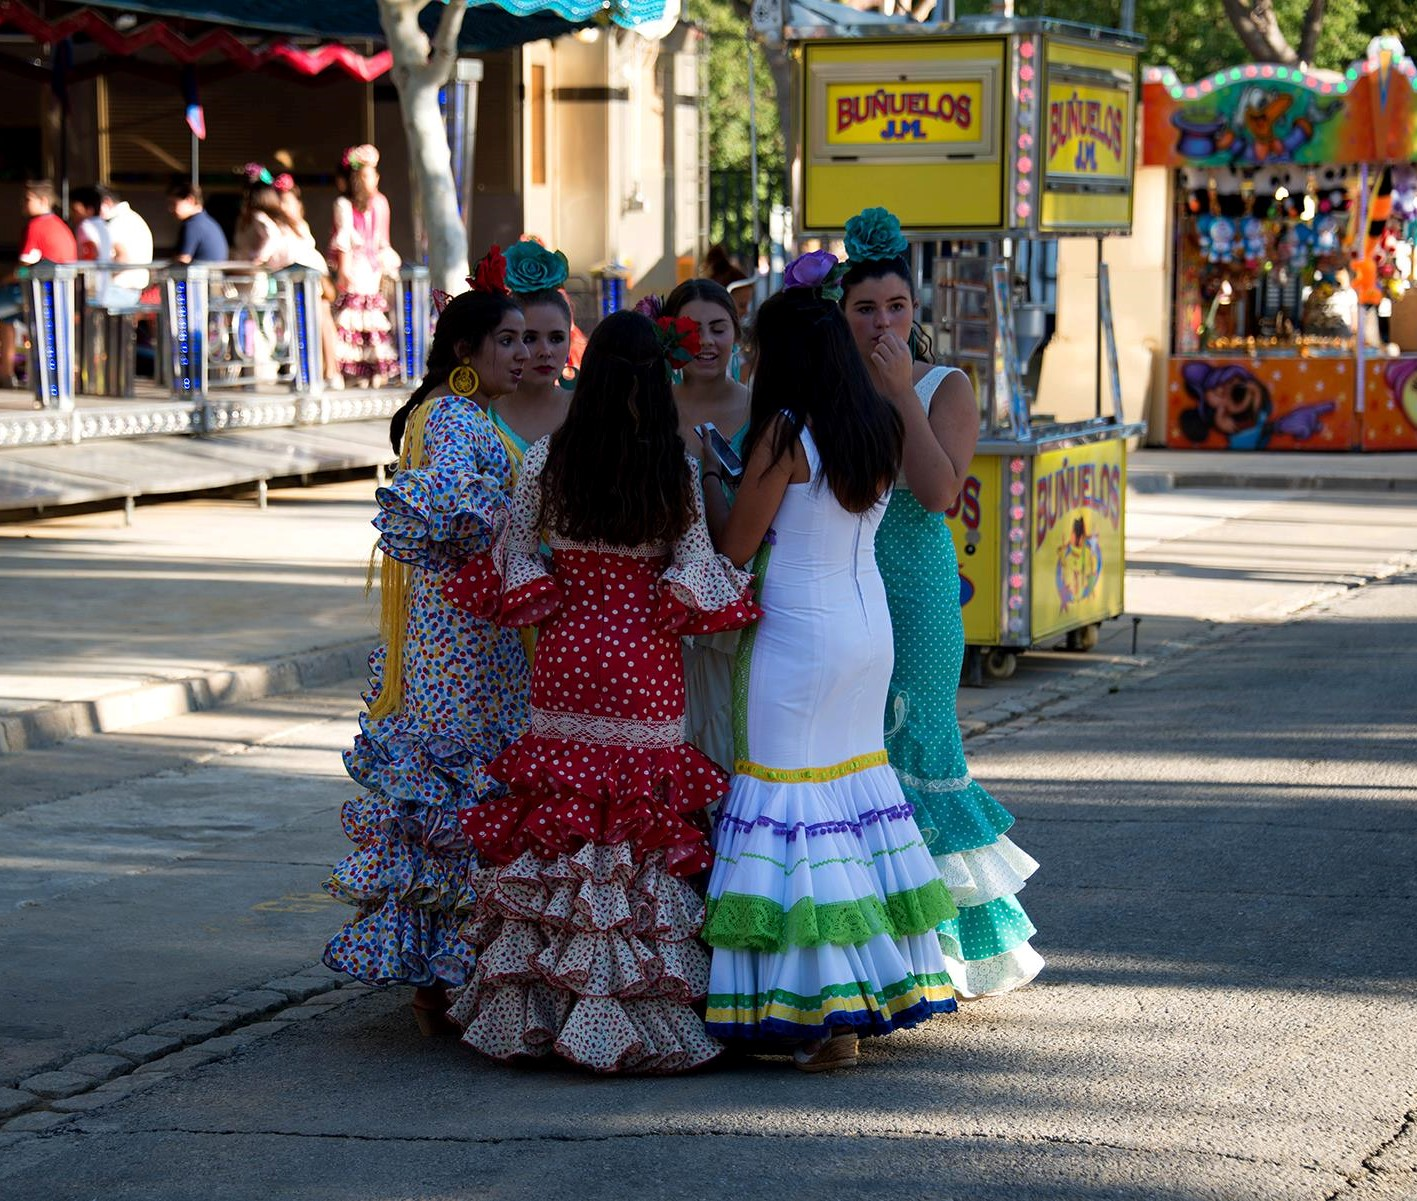 Lovely señoritas.